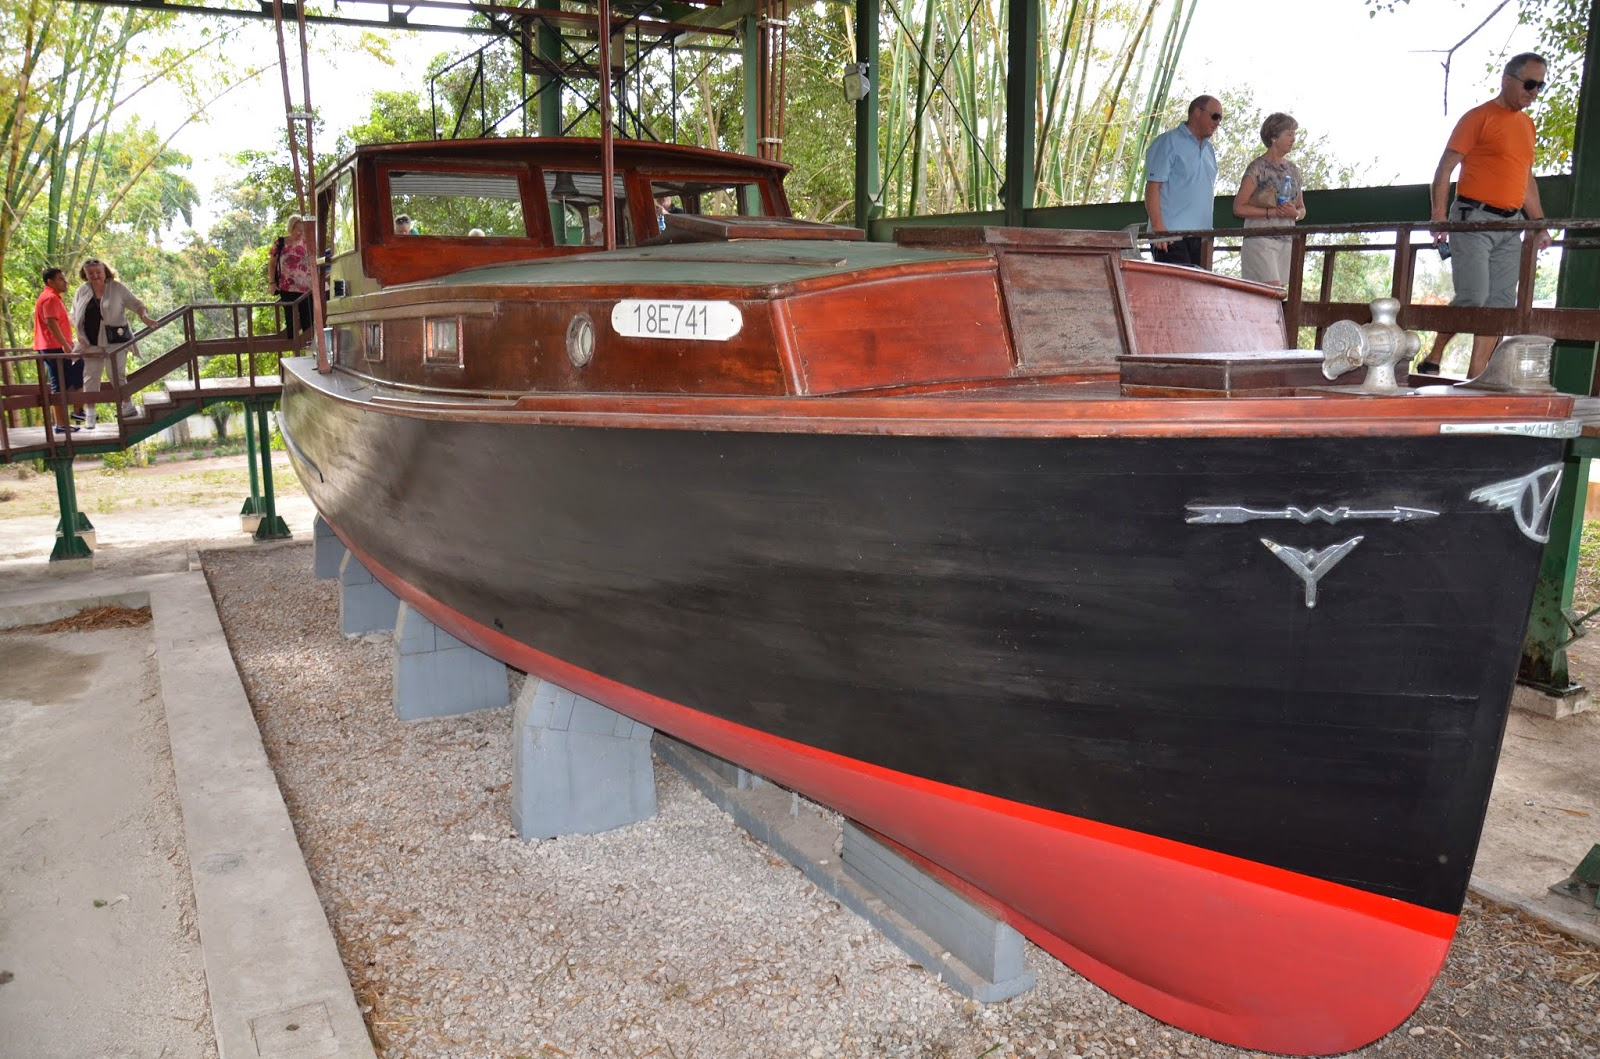 baugh s blog photo essay pilar hemingway s boat at finca vigia photo essay pilar hemingway s boat at finca vigia in